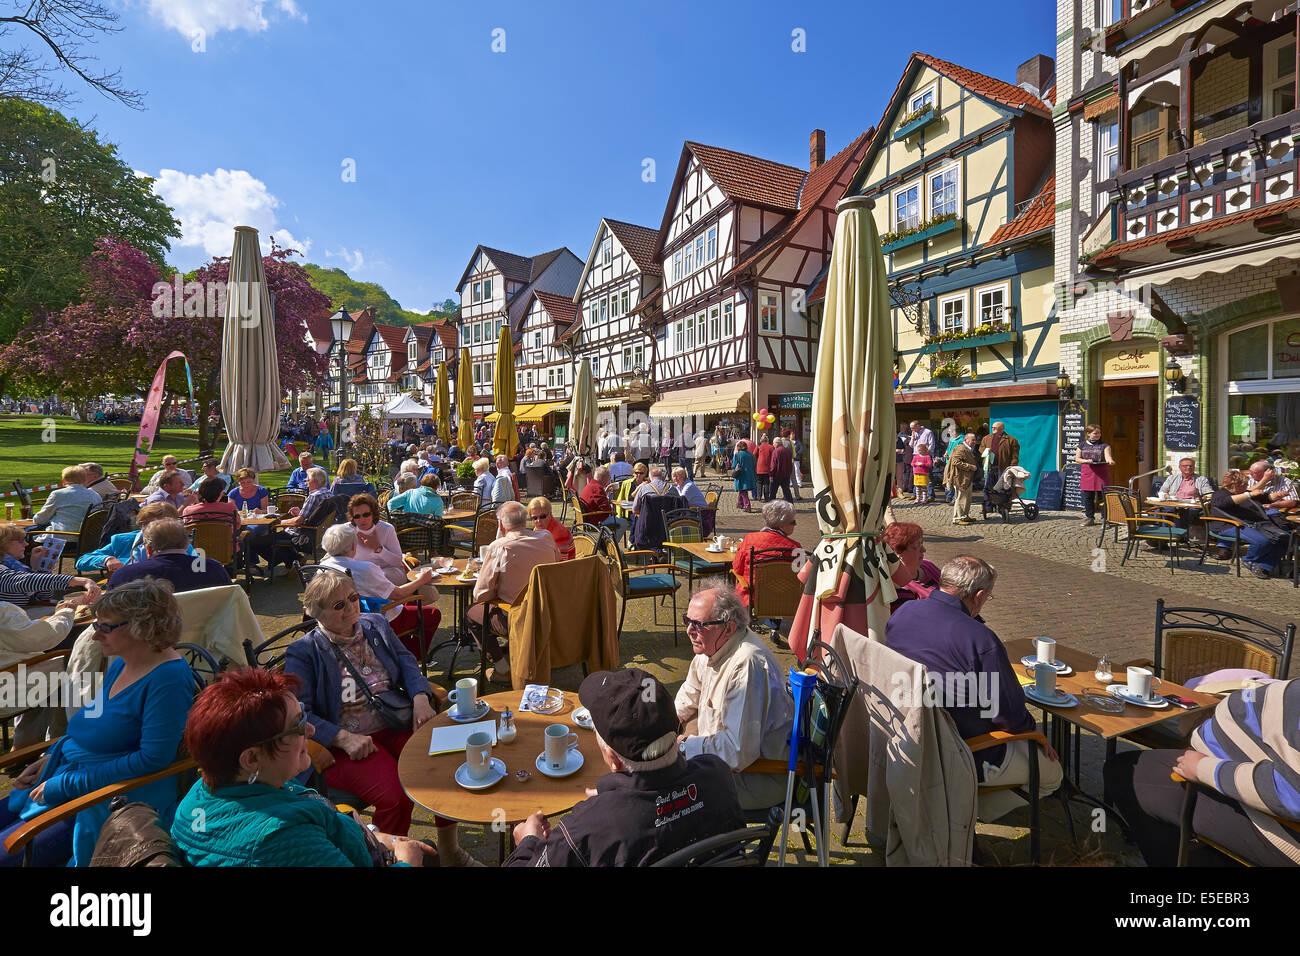 Bad Sooden, Bad Sooden-Allendorf, Hessen, Deutschland Stockfoto